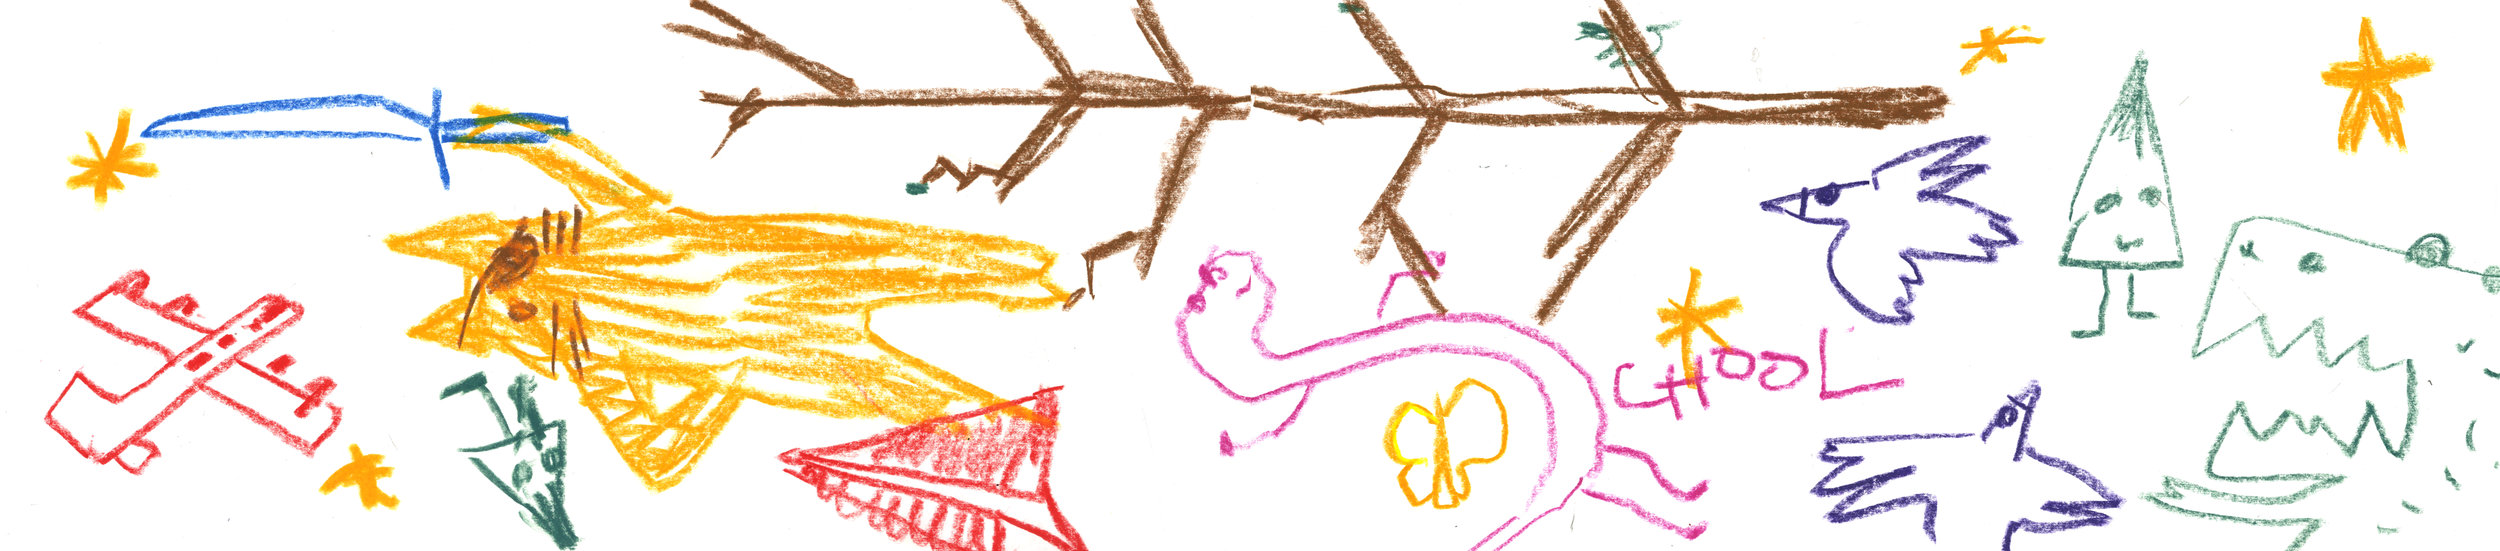 Doodle Spread.jpg